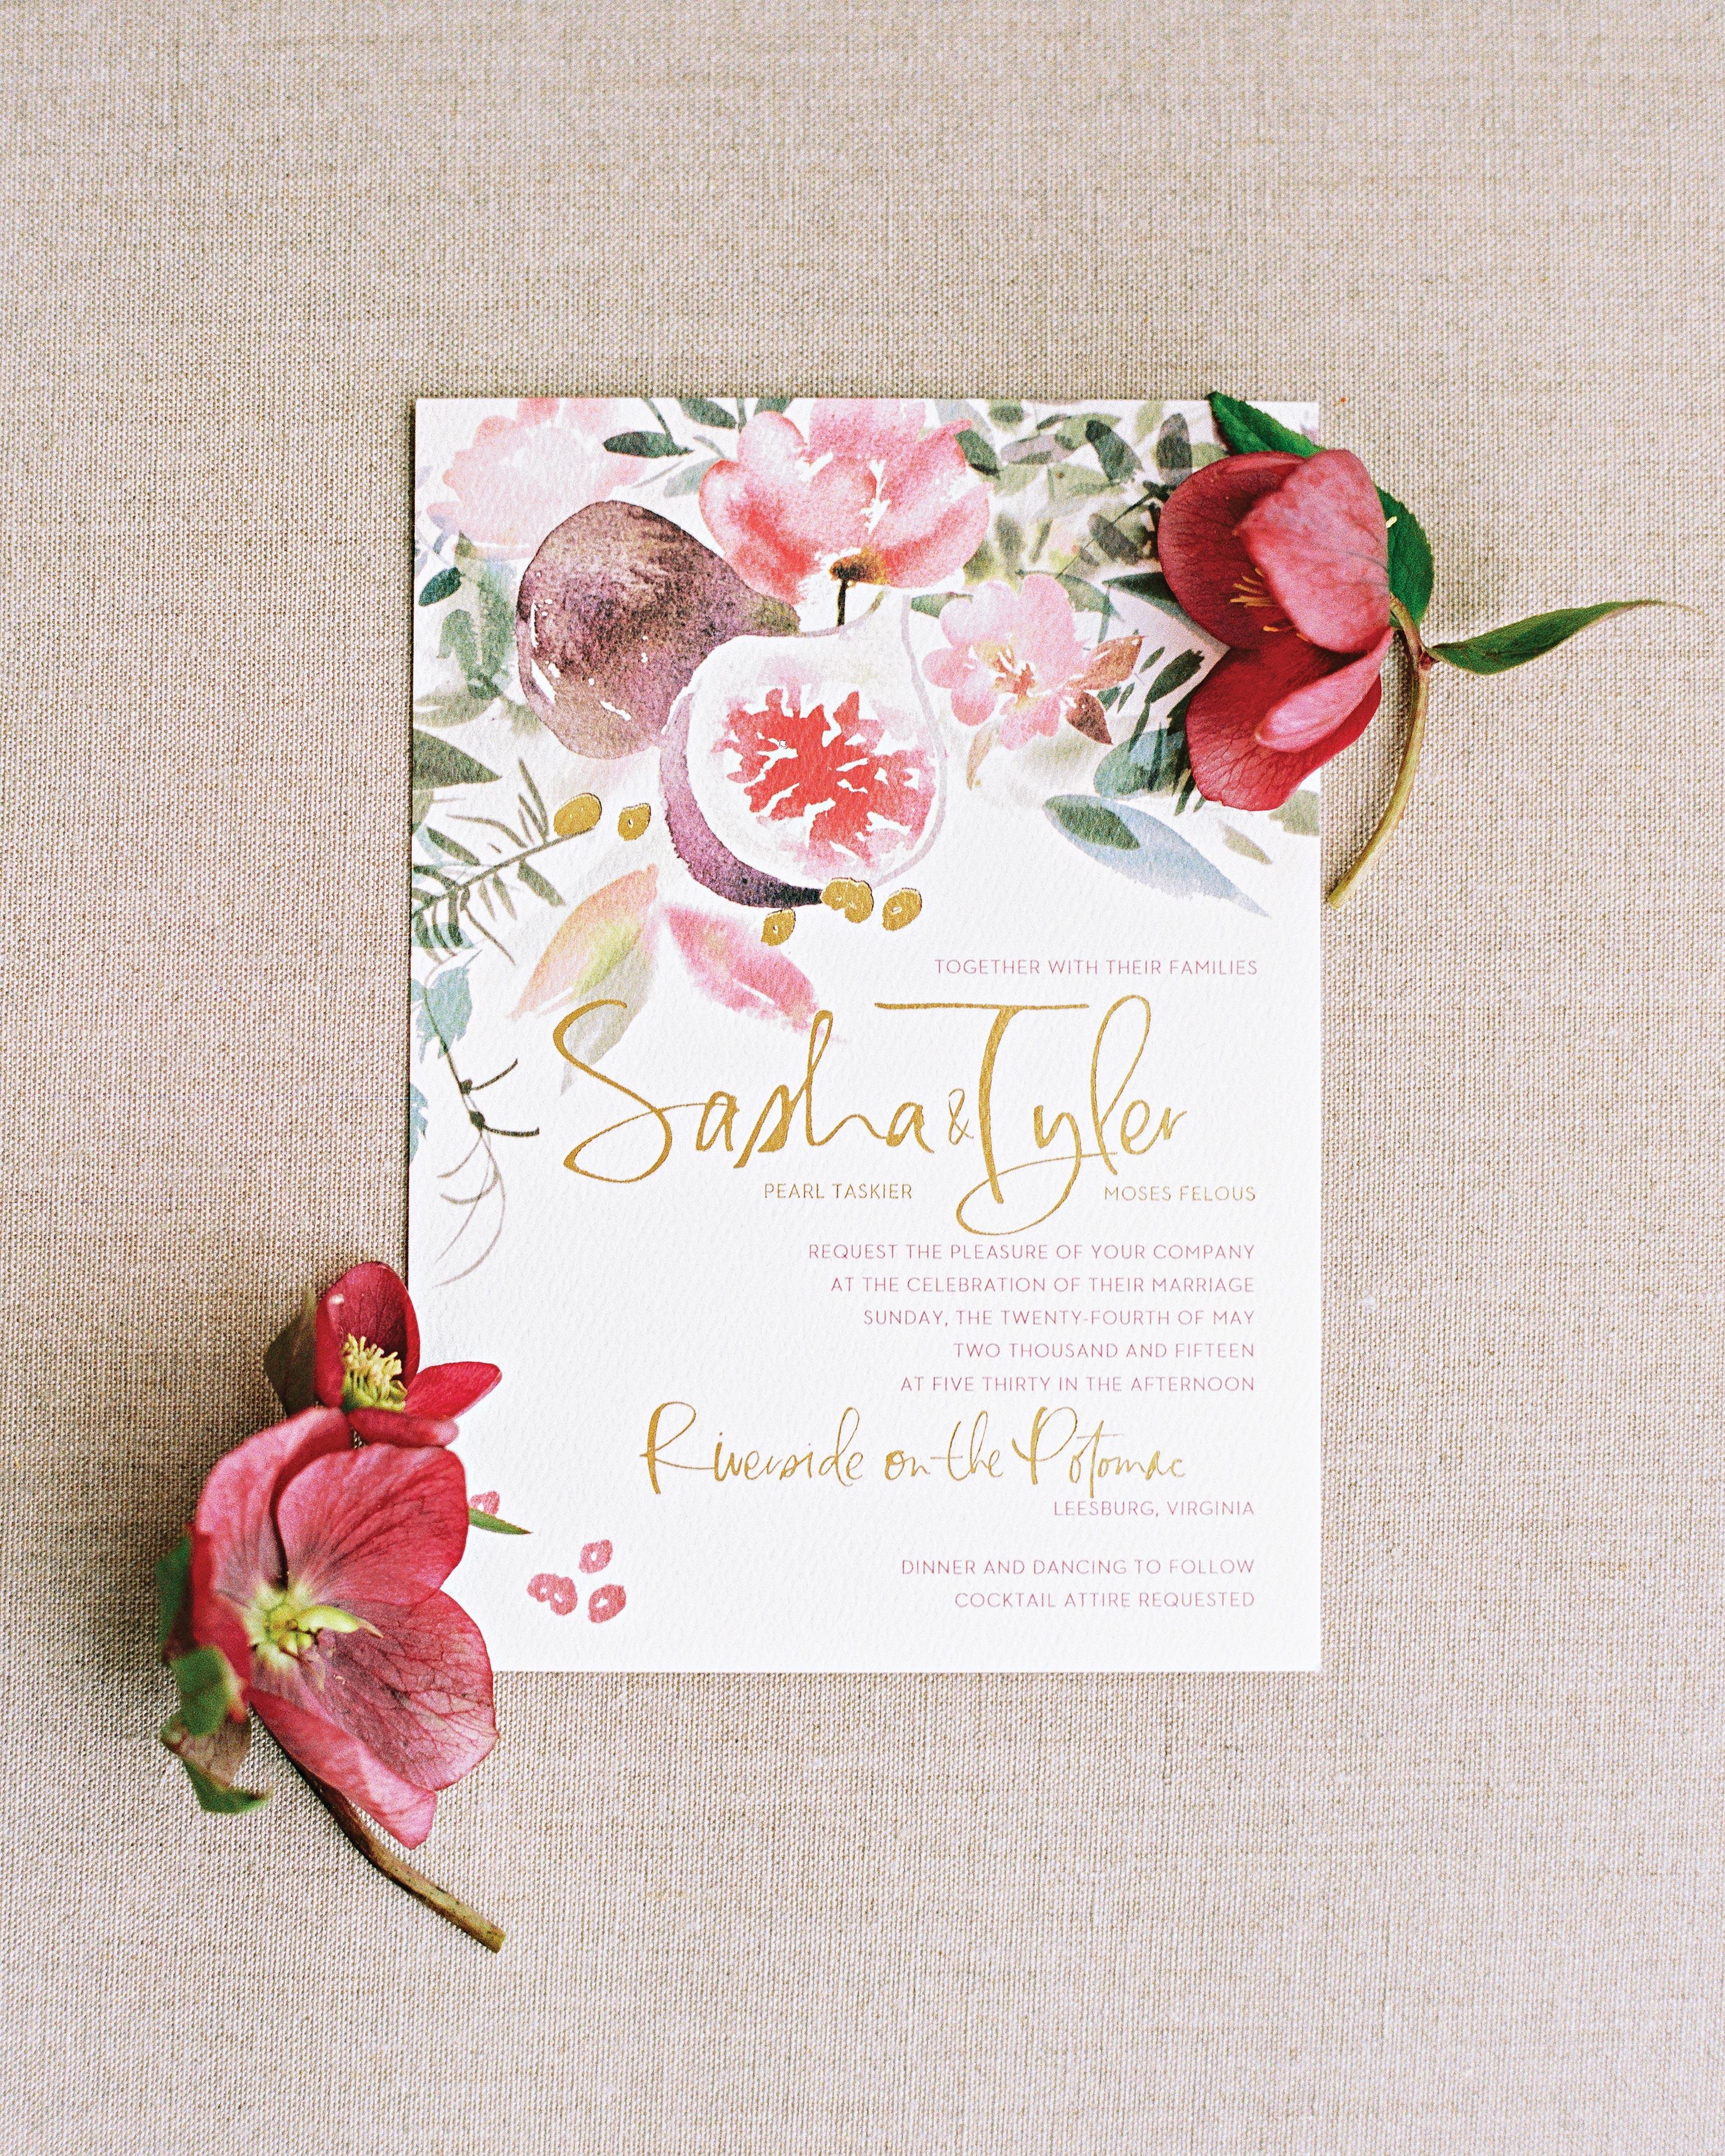 sasha-tyler-wedding-virginia-invitation-15-s112867.jpg